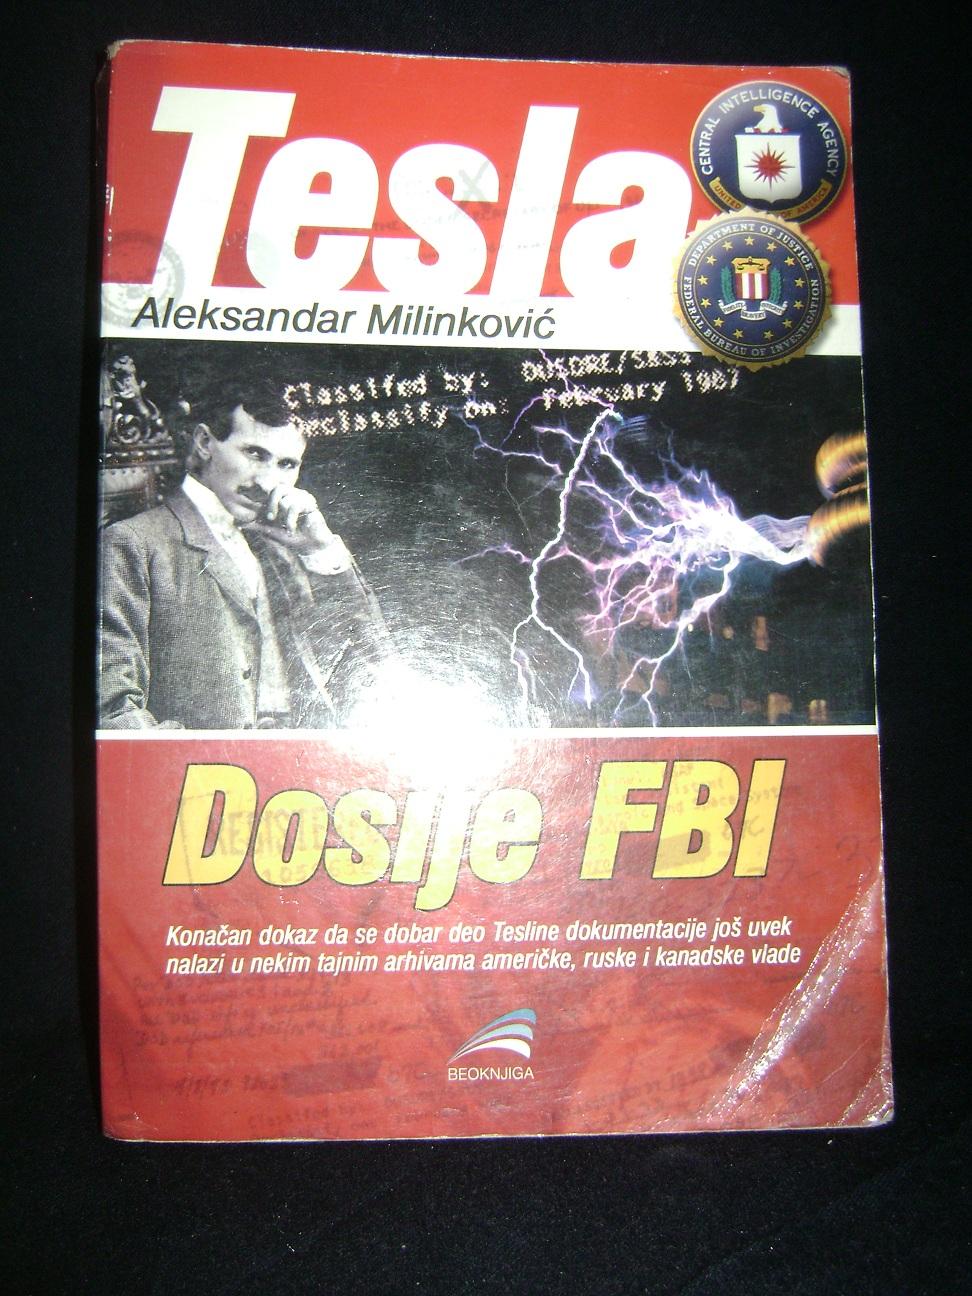 TESLA_DOSIJE_FBI_Aleksandar_Milinković.JPG